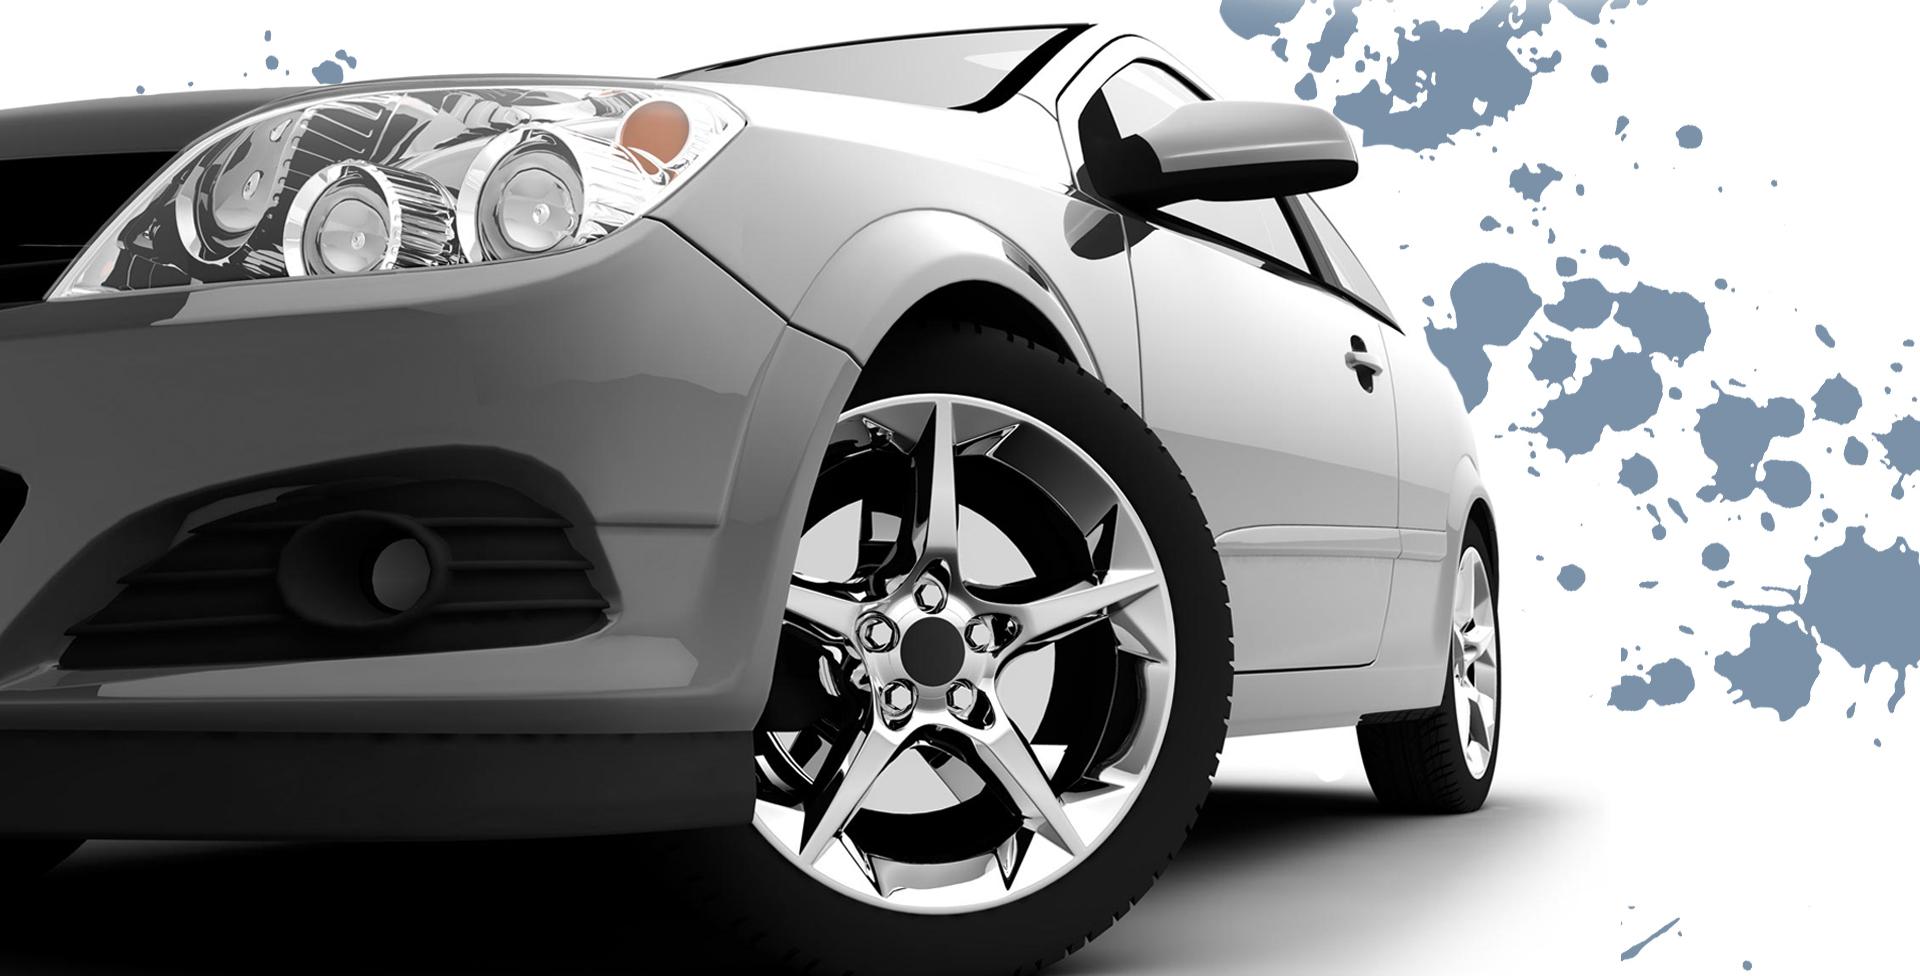 Are Volkswagens Expensive To Fix | 2017, 2018, 2019 Volkswagen Reviews